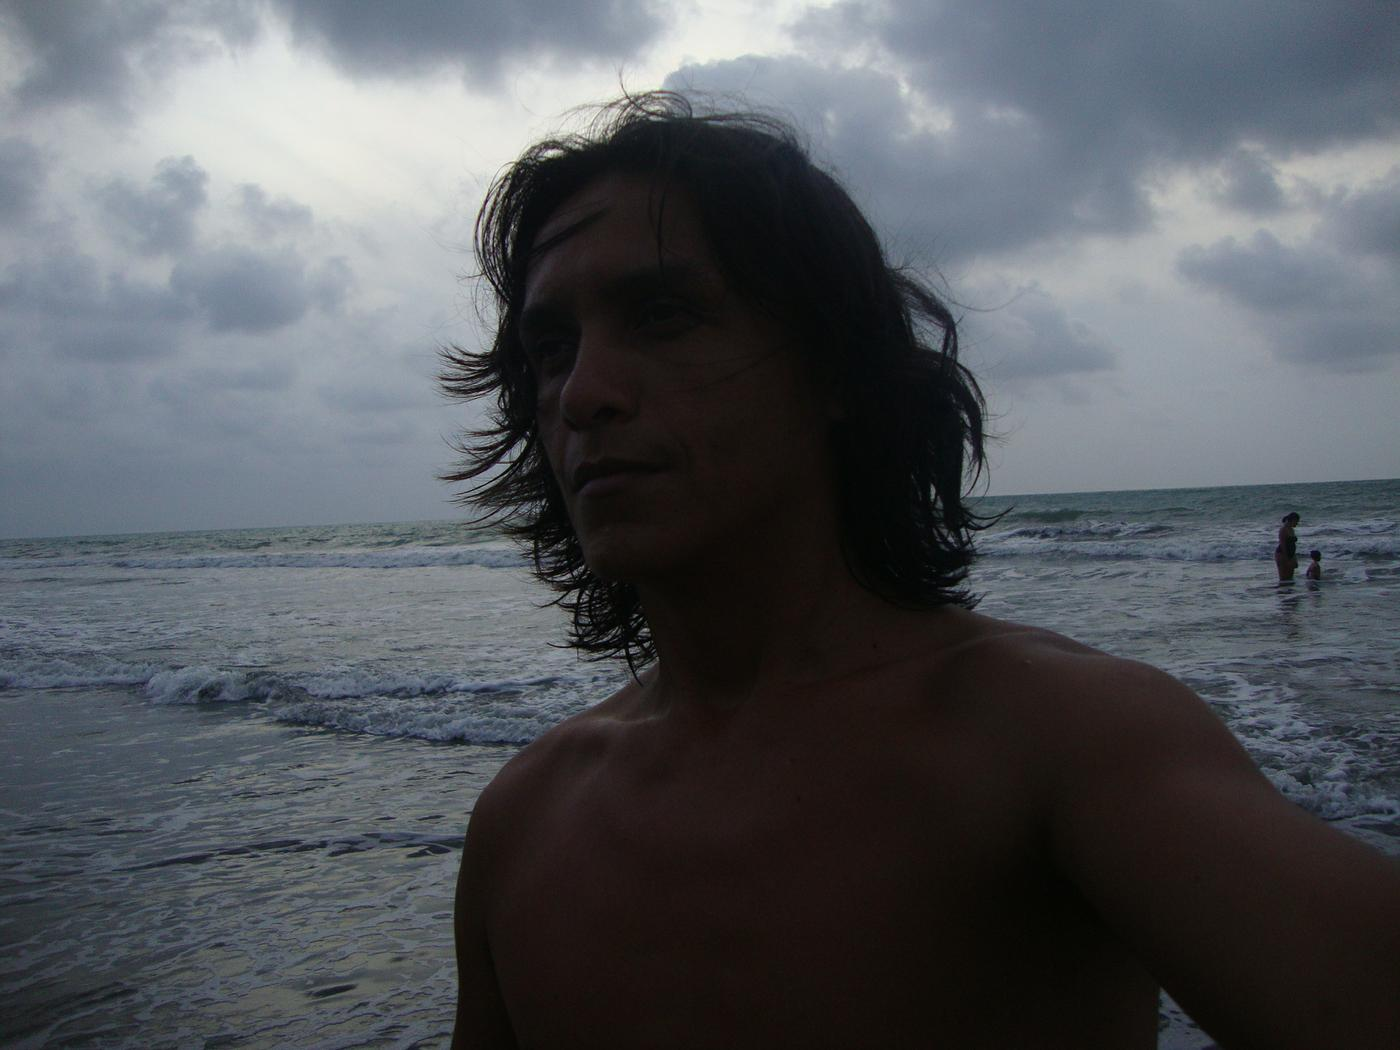 Oscar Hoyos